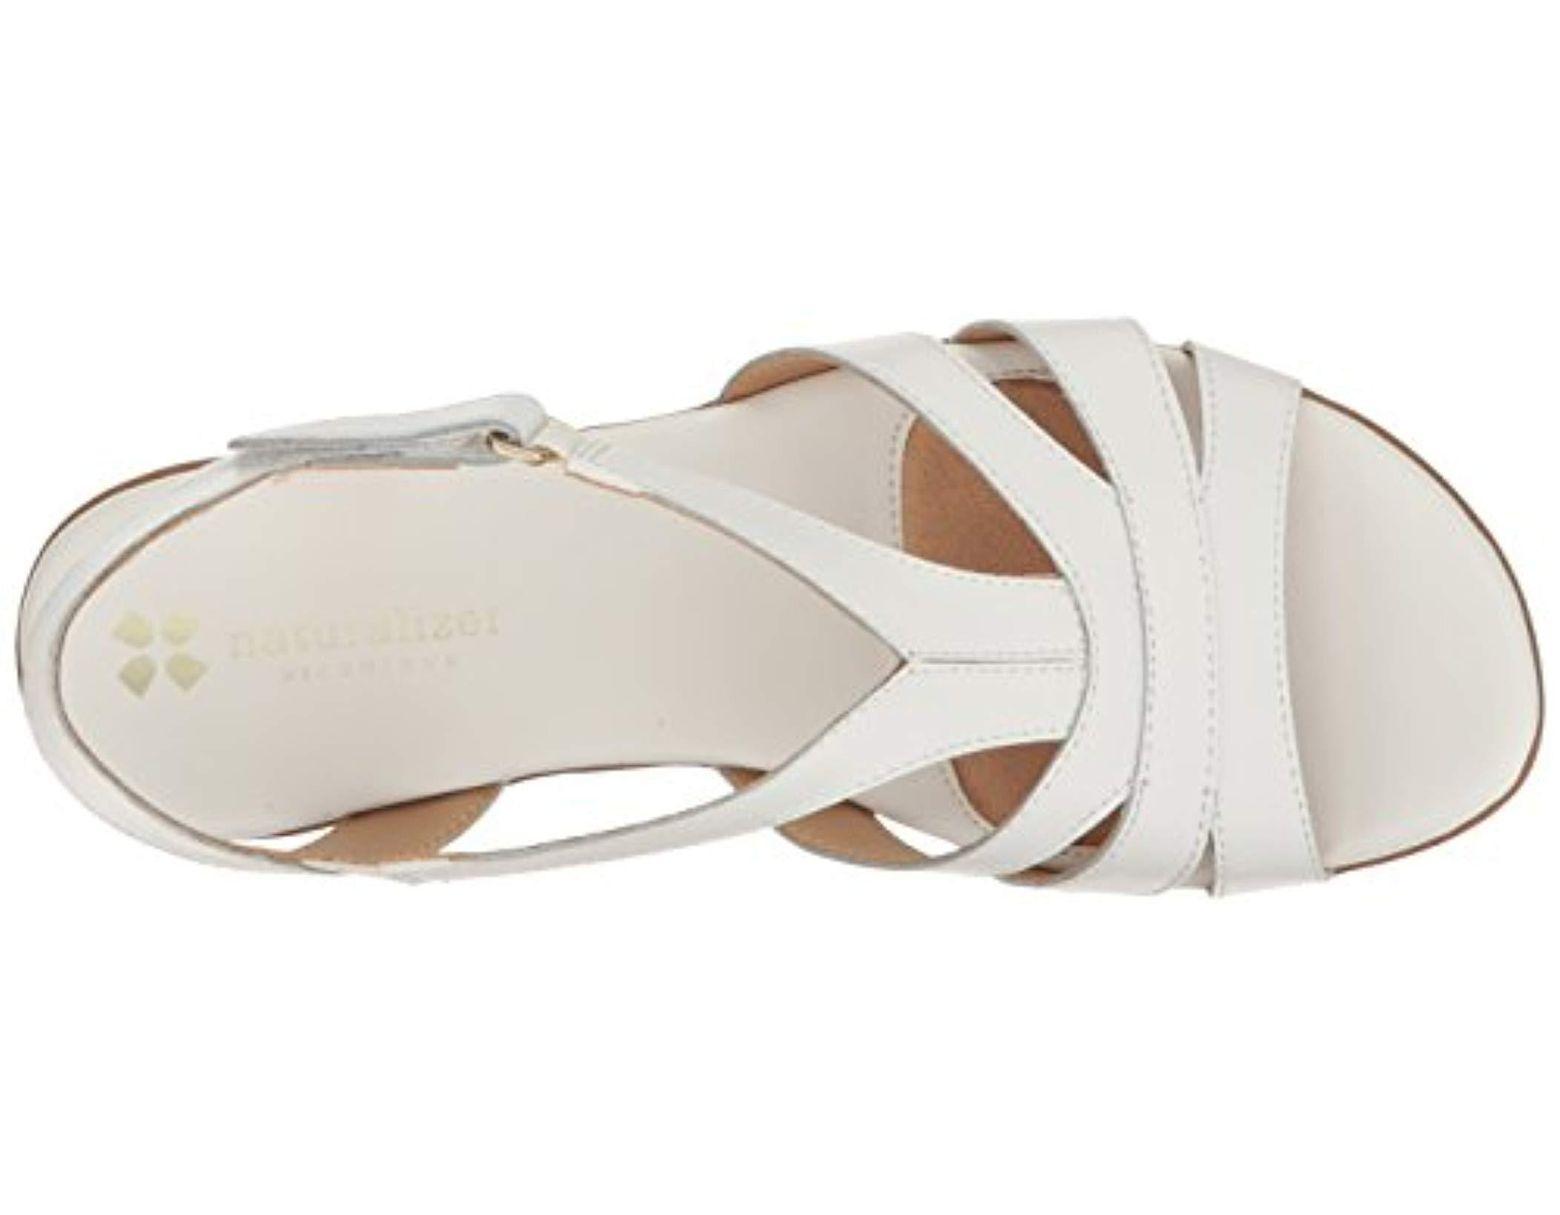 f24ebb10a4f89 Lyst - Naturalizer Neina Huarache Sandal in White - Save 35%